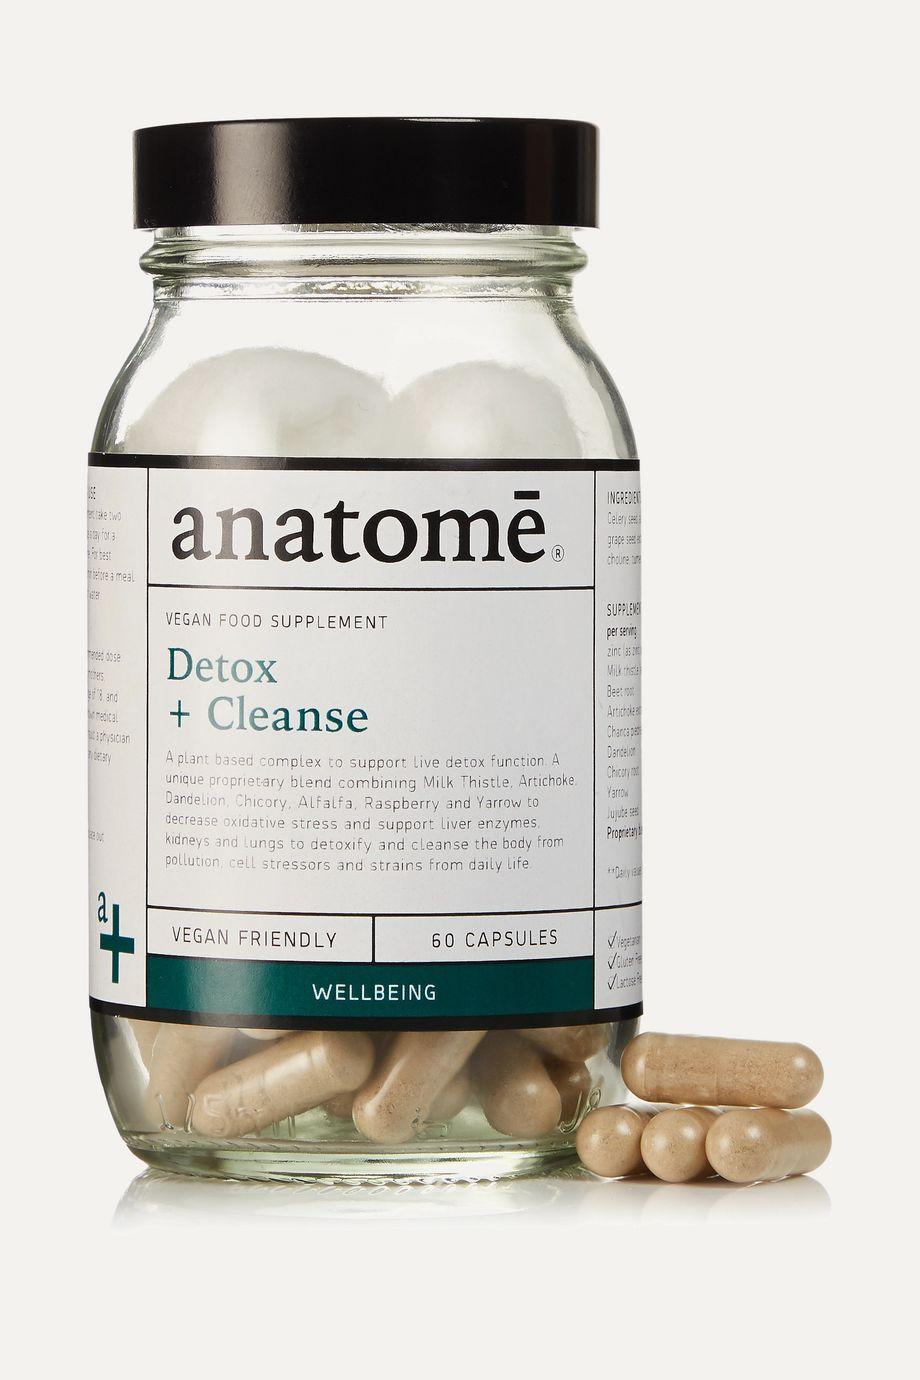 anatomē Vegan Food Supplement - Detox + Cleanse (60 capsules)